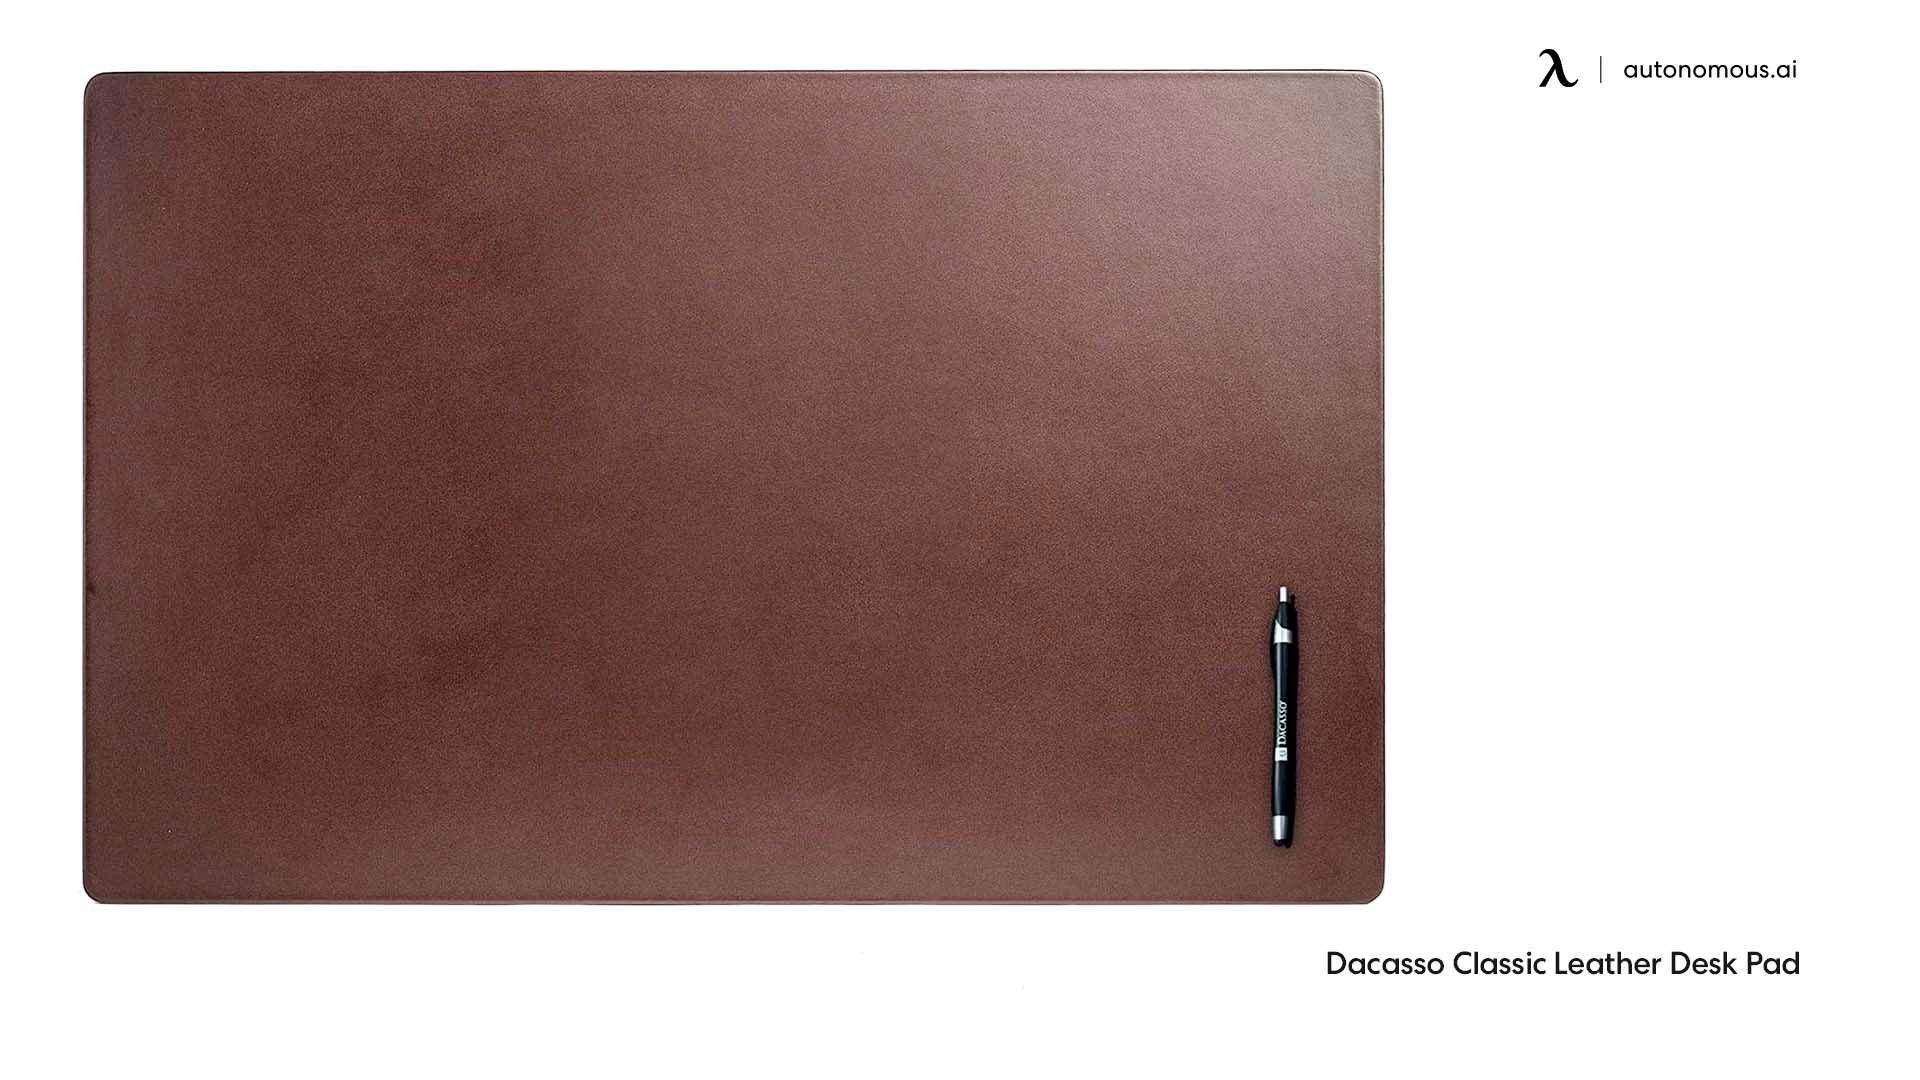 Dacasso Classic Leather Desk Pad